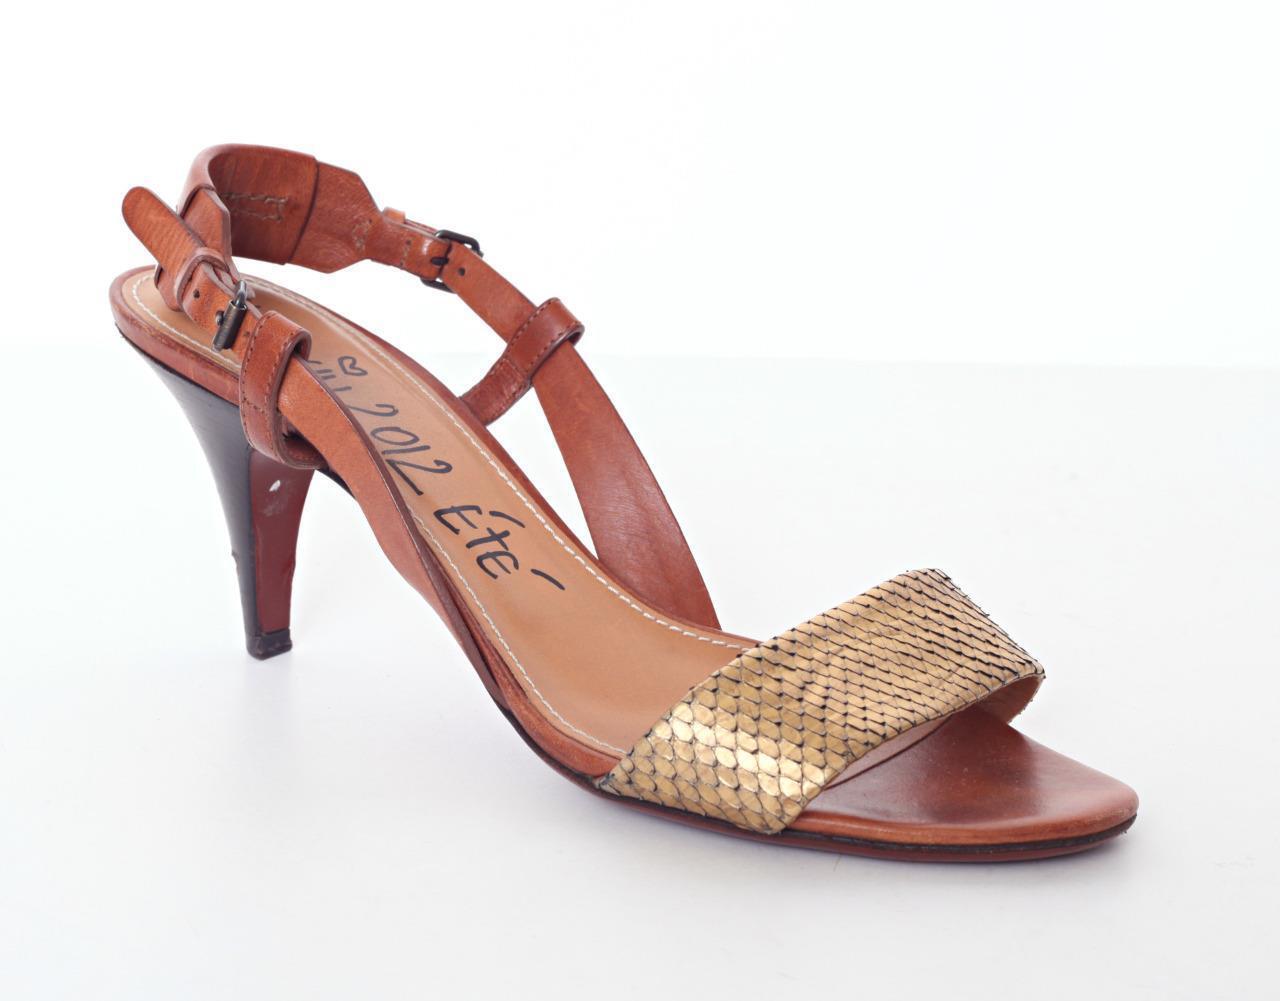 LANVIN Tan & Gold Snake Print Leather High Heel Slingback Sandal Pump 10-40